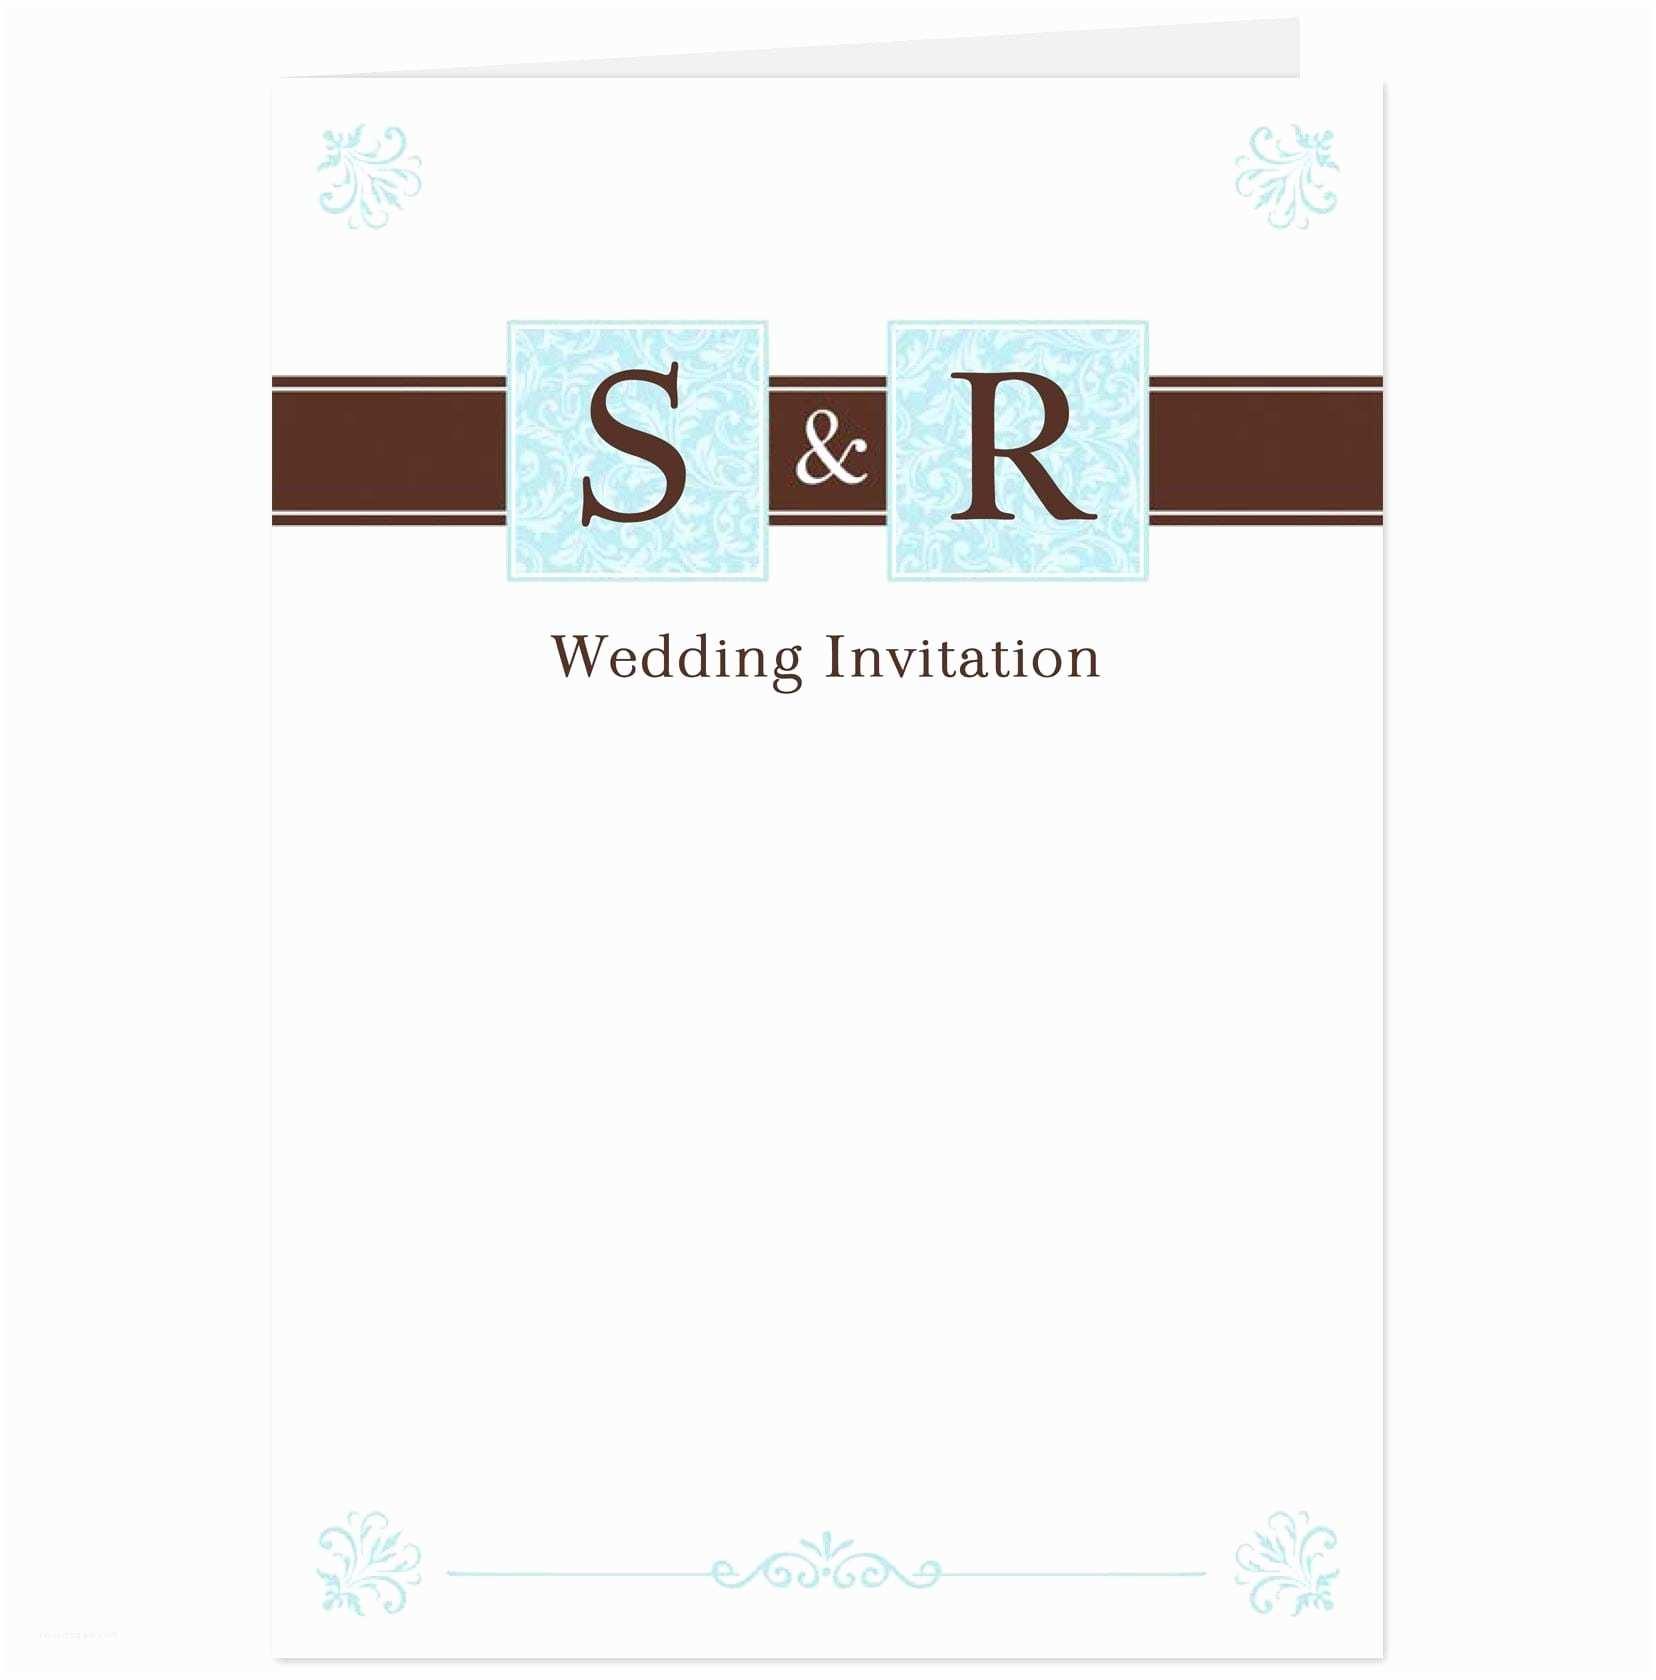 Hallmark Wedding Invitations Hallmark Wedding Invitation